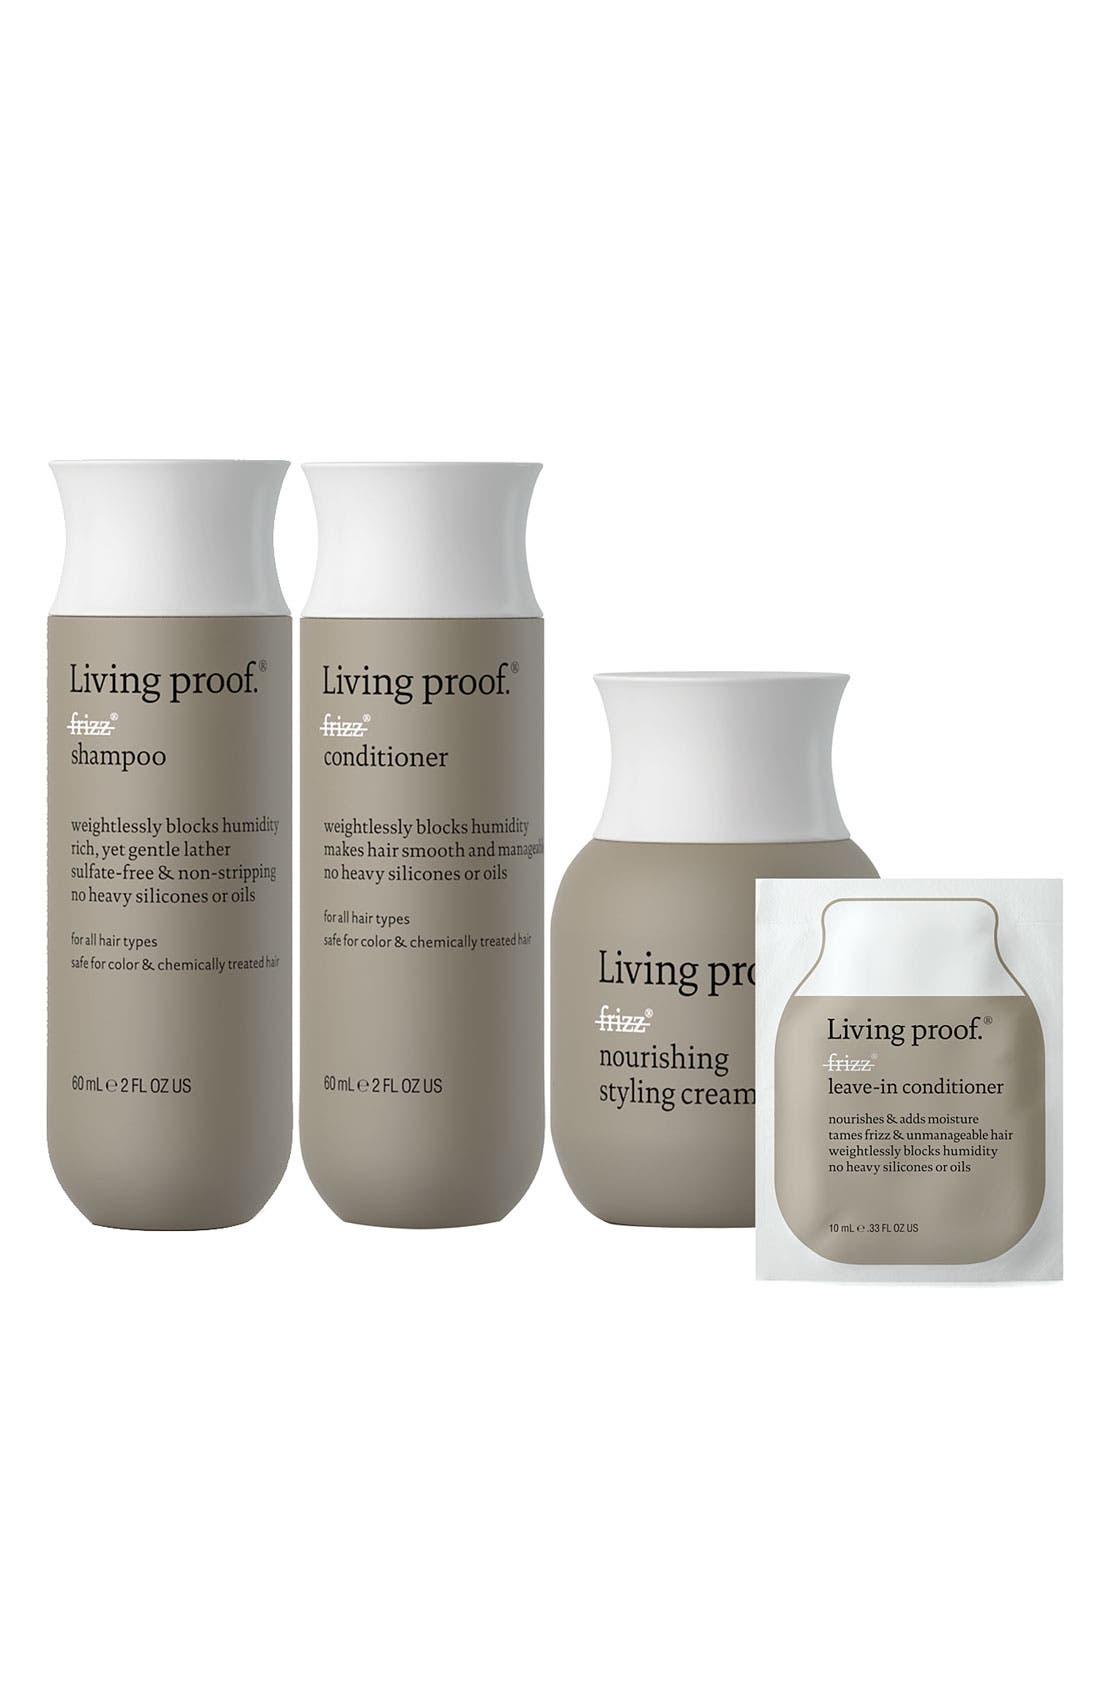 Living proof® No Frizz Discovery Set ($36 Value)